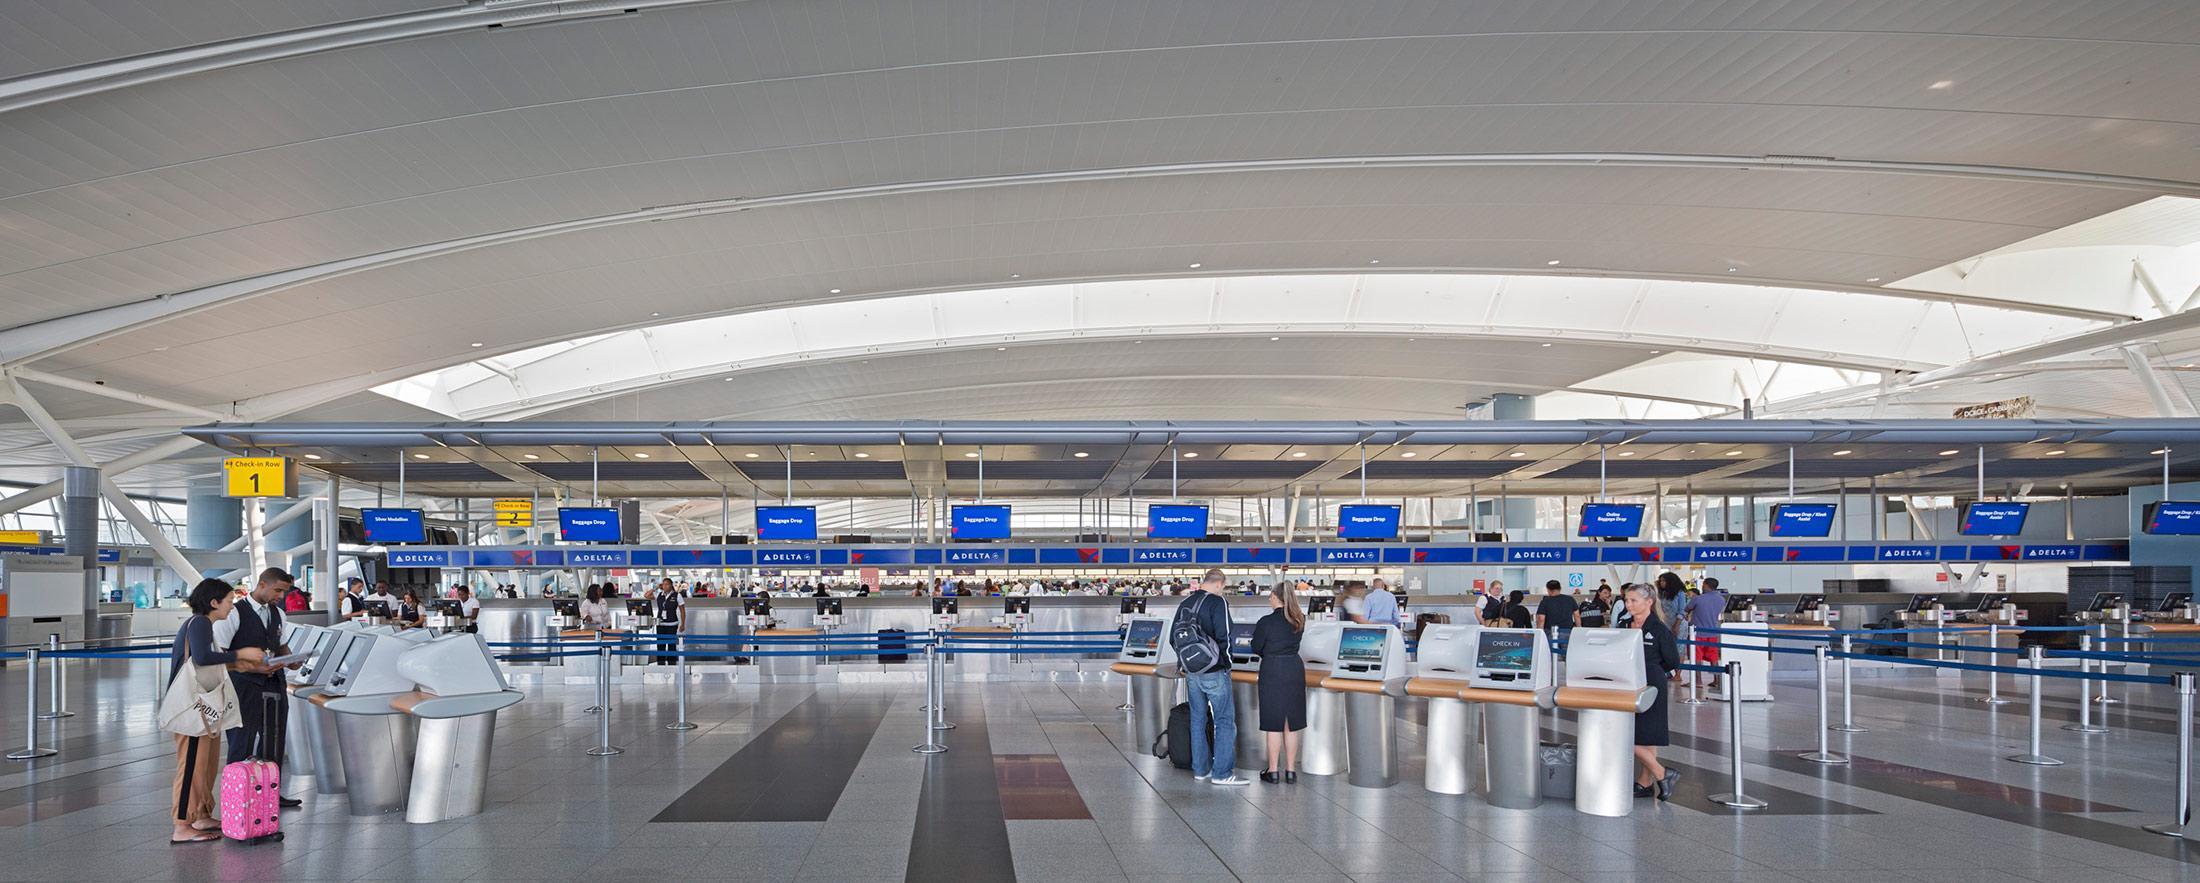 John F Kennedy International Airport Terminal 4 Steel